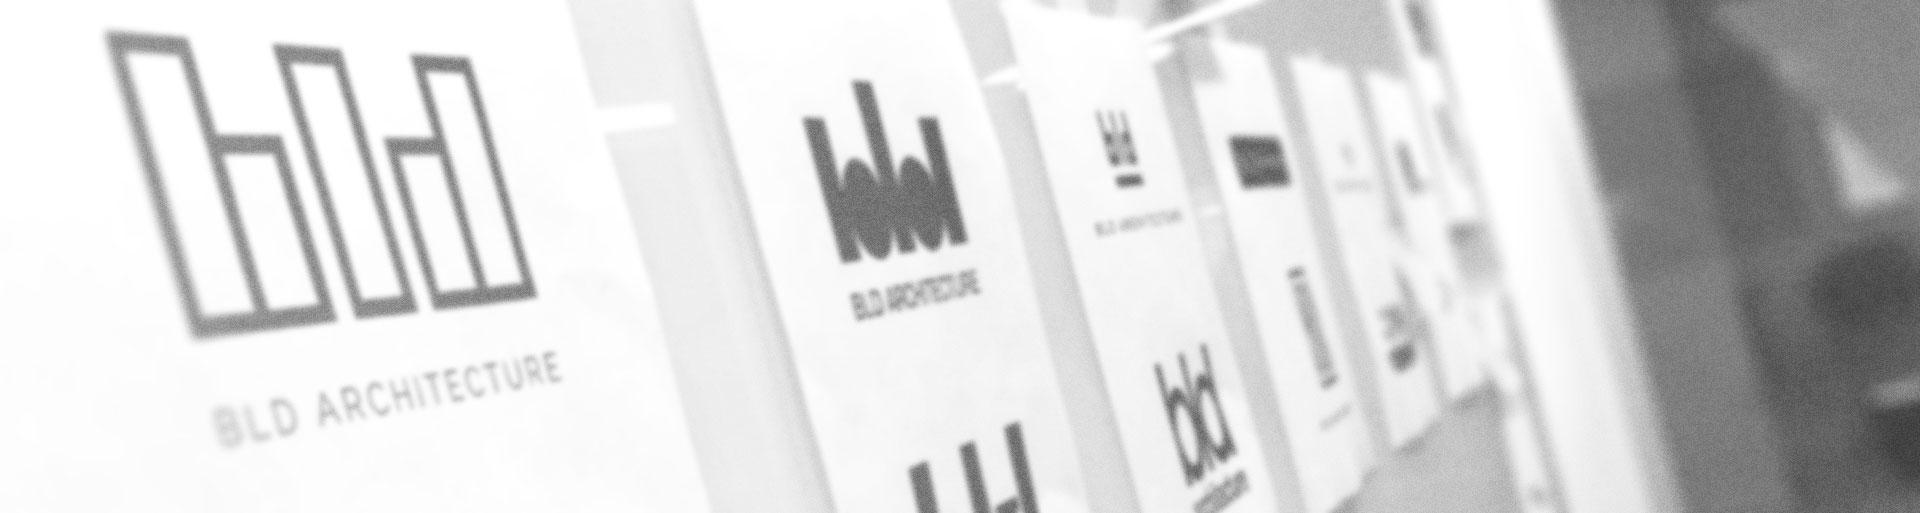 BLD Architecture logo concepts